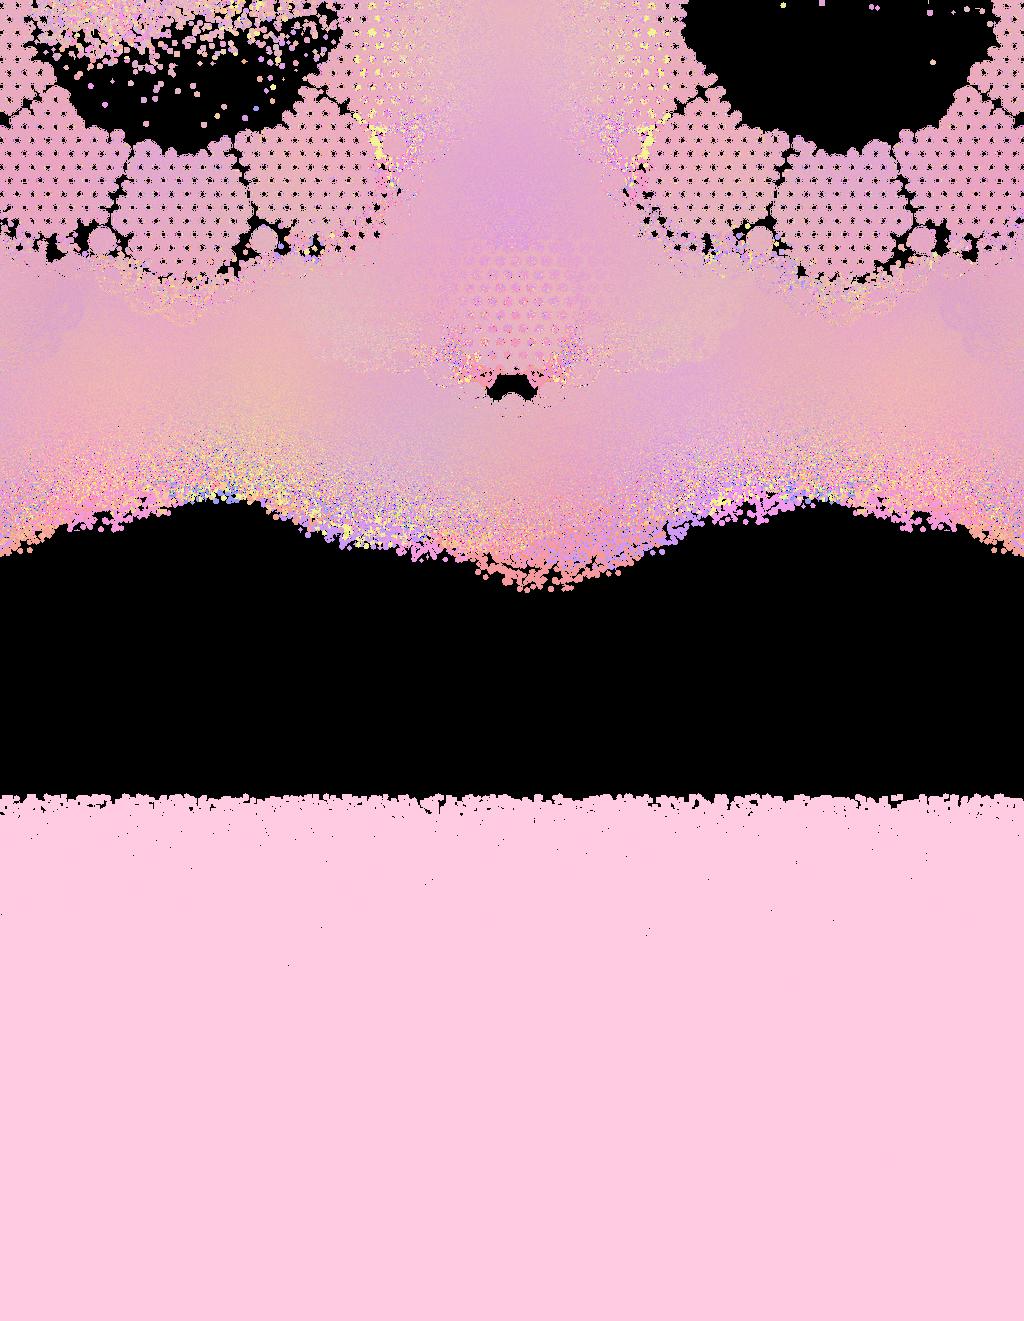 Pink lace - 8.5x11 by SparkleStuff on DeviantArt